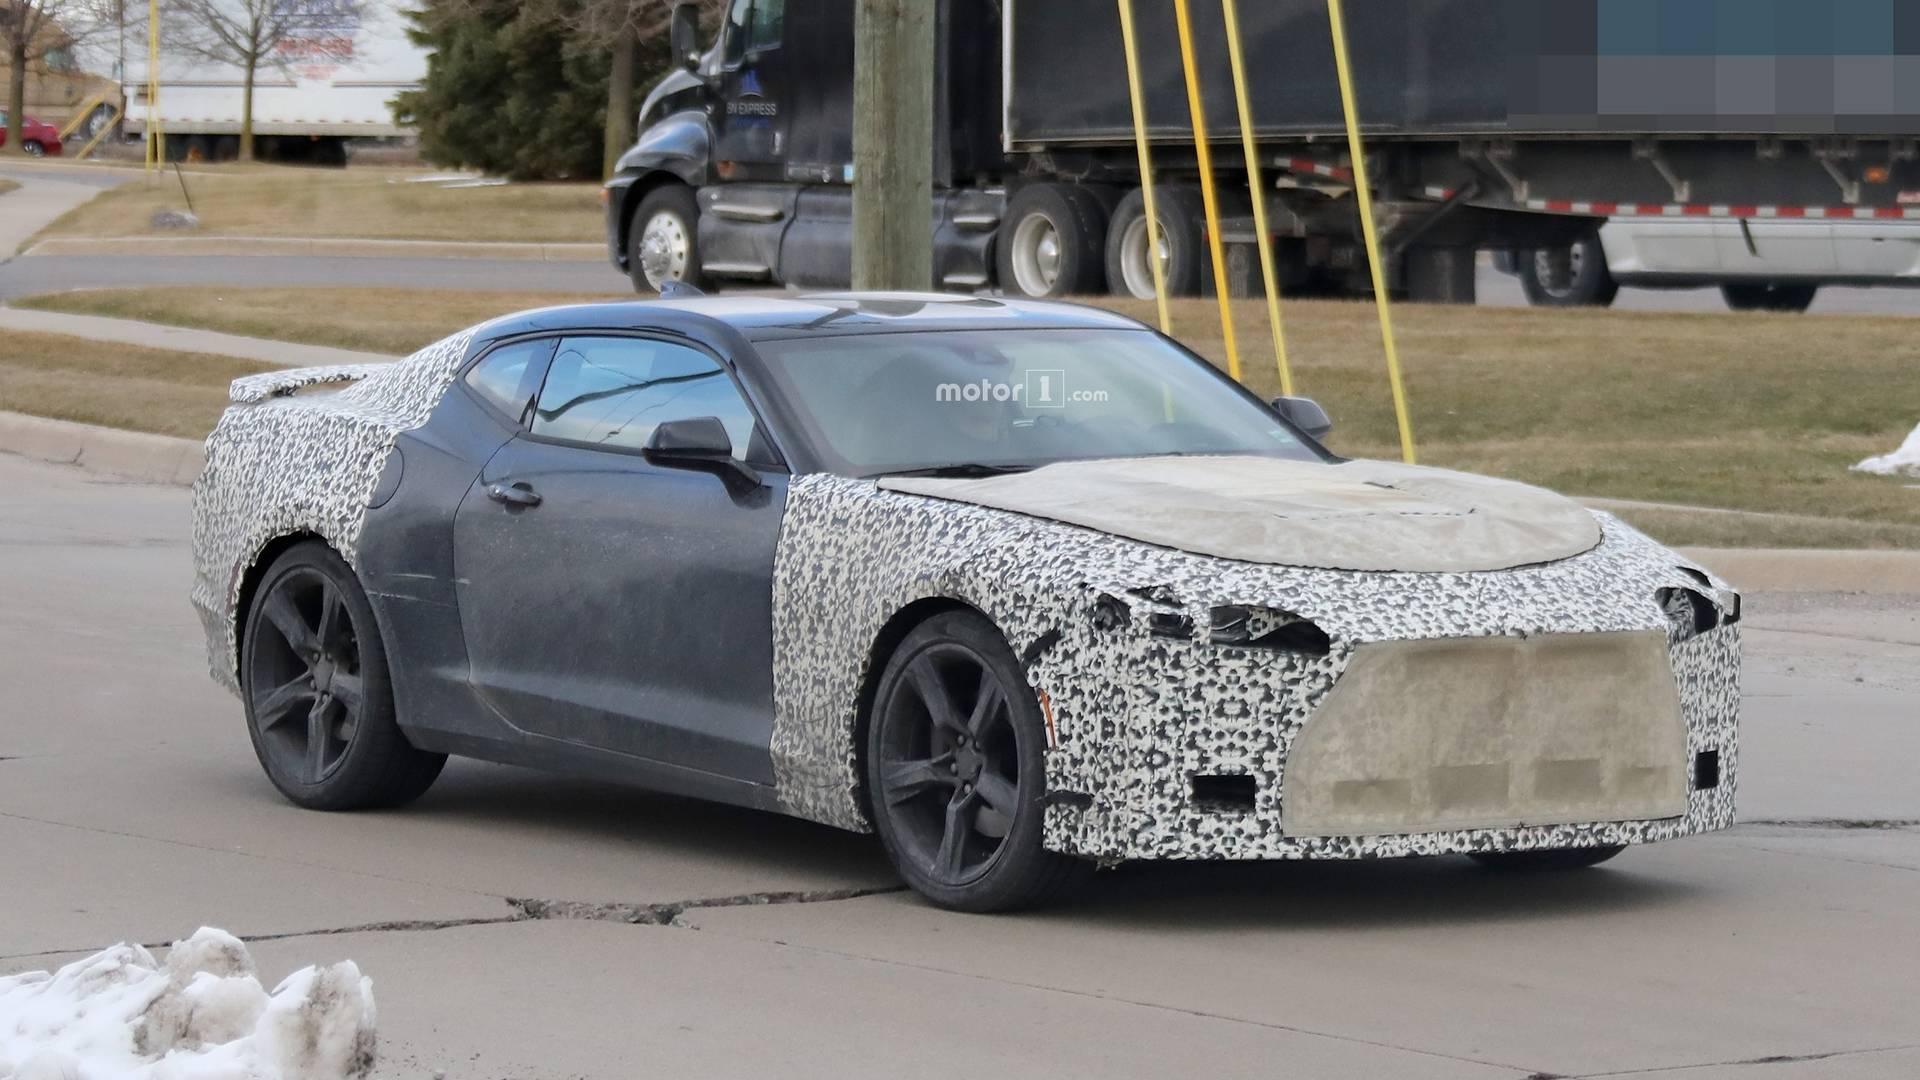 2019 Chevy Camaro Spied Showing Off Its Interior